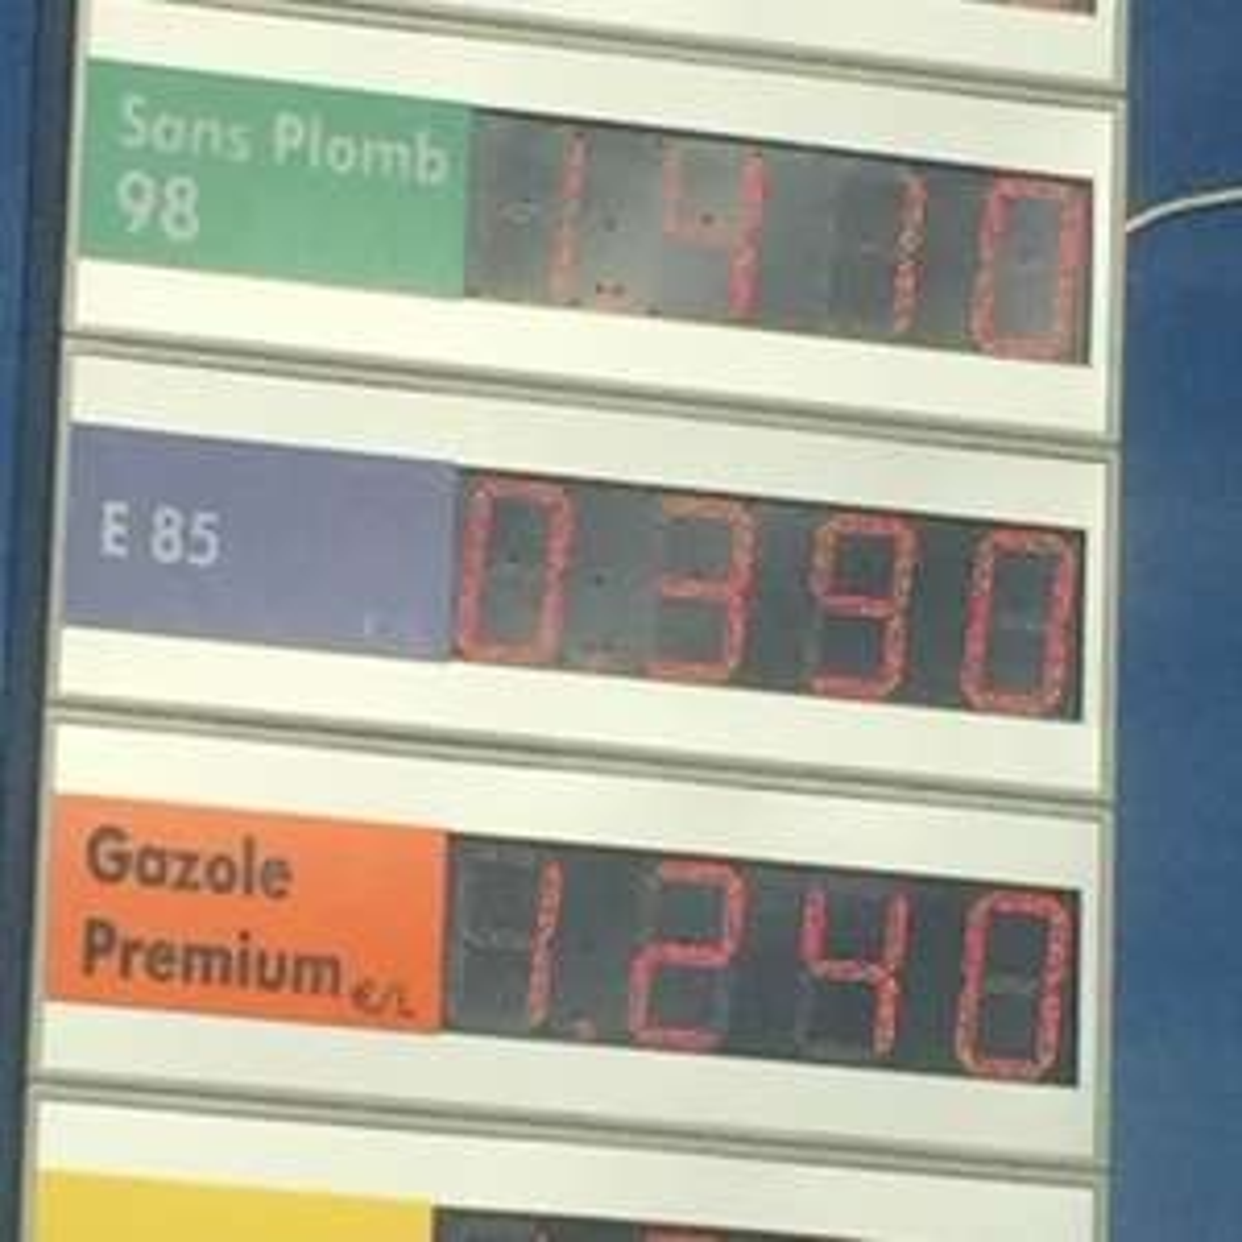 Carburant Bio éthanol (E85) a 0,39€/L - Blagnac (31)